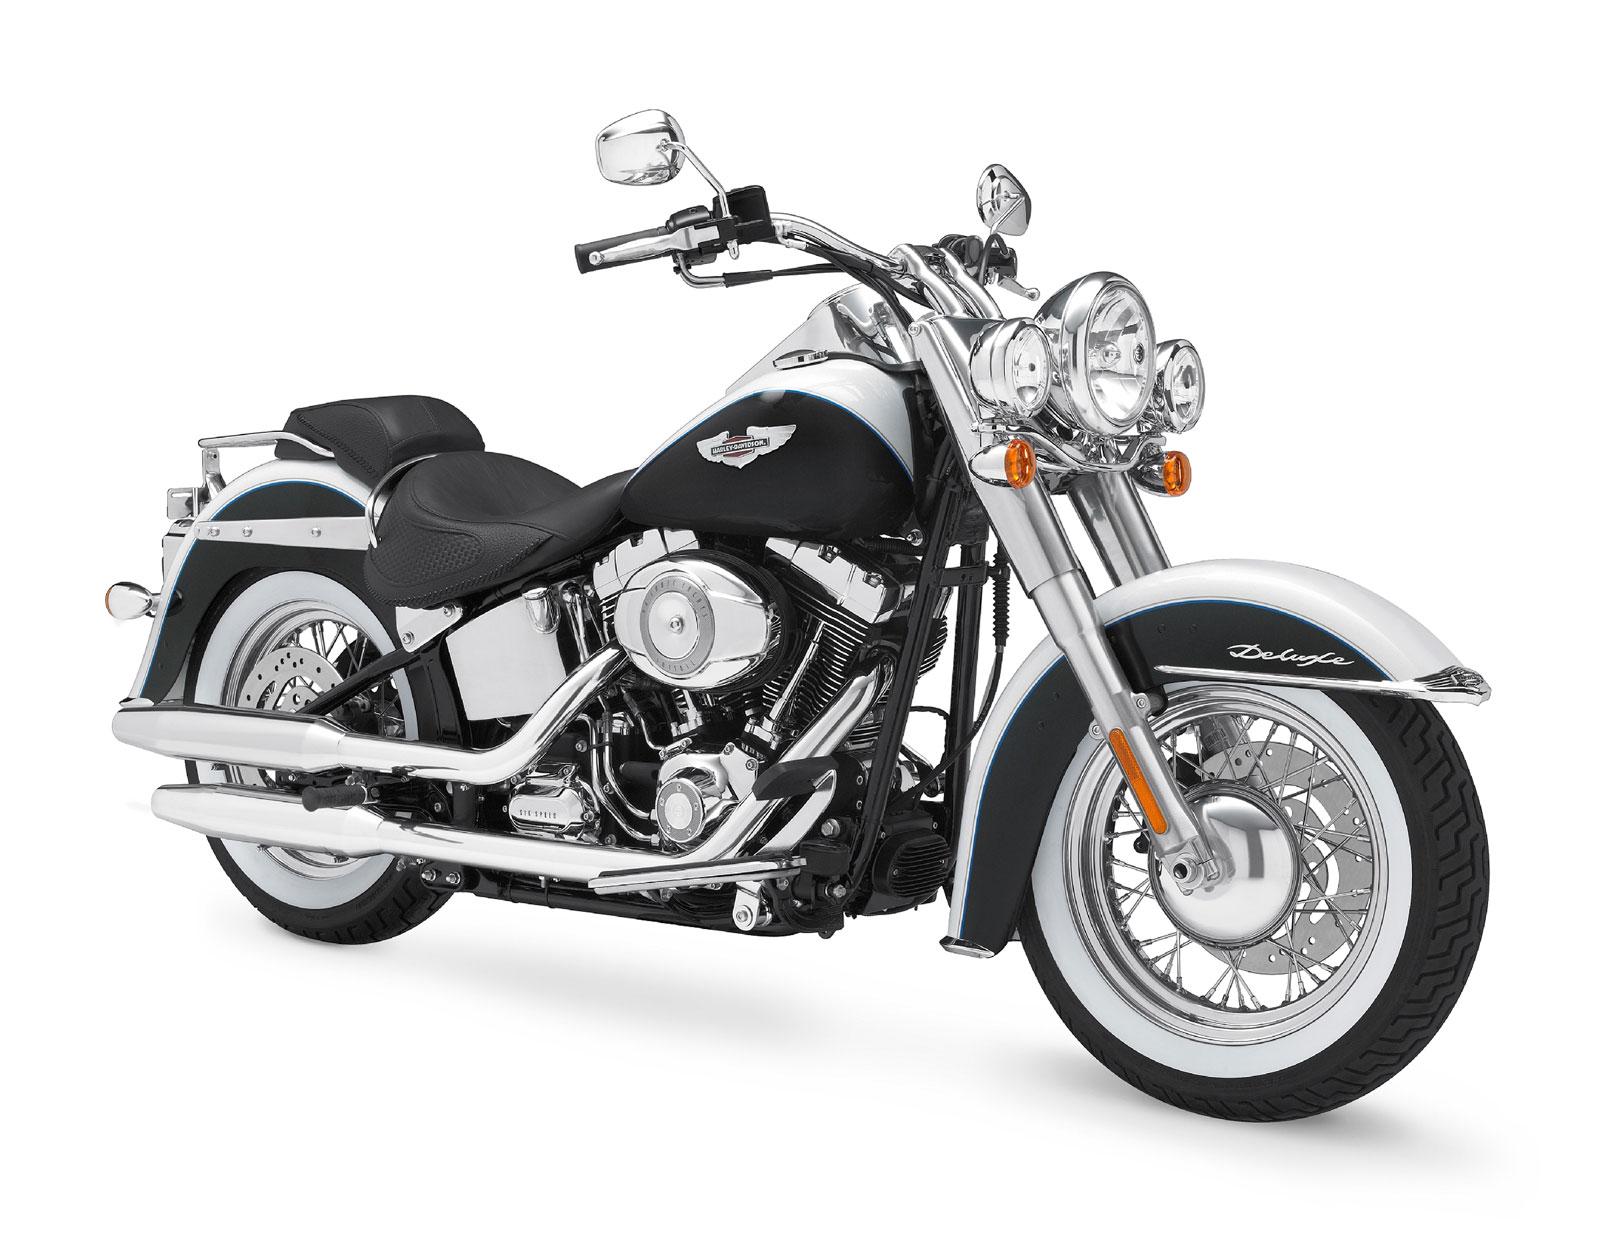 harley davidson custom bikes 2009 Harley-Davidson FLSTN Softail Deluxe